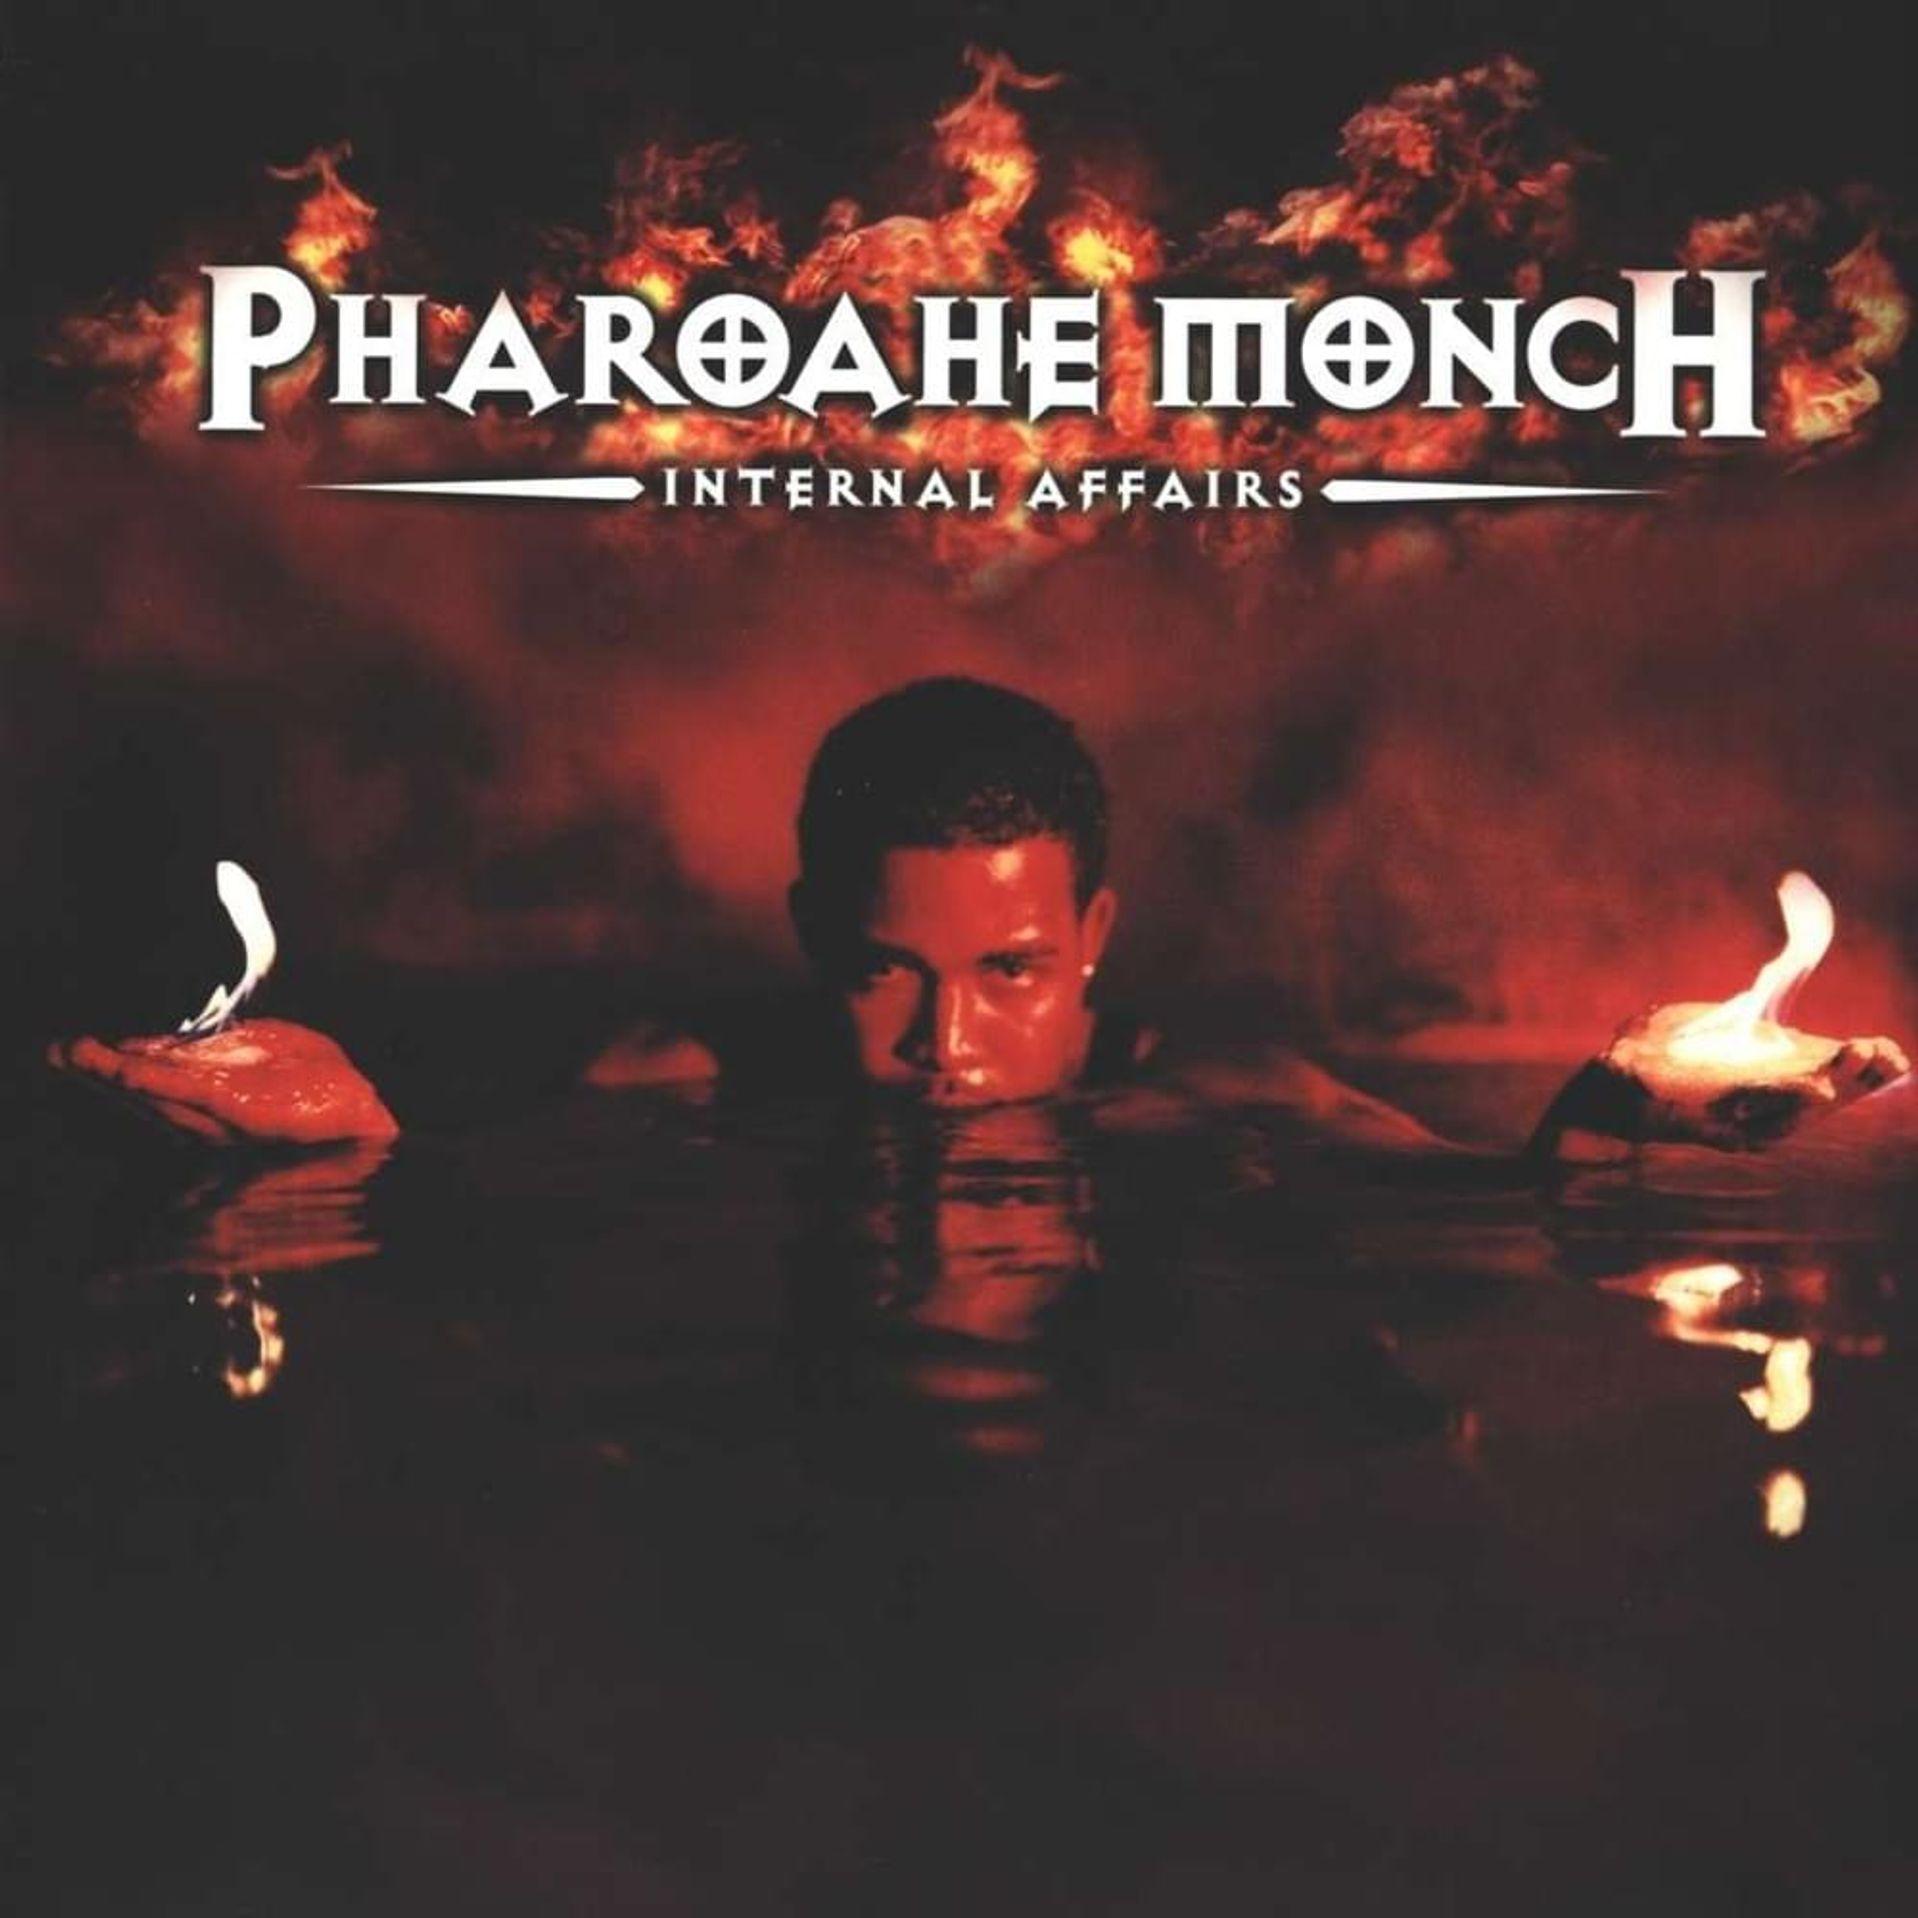 Album Title: Internal Affairs by: Pharoahe Monch